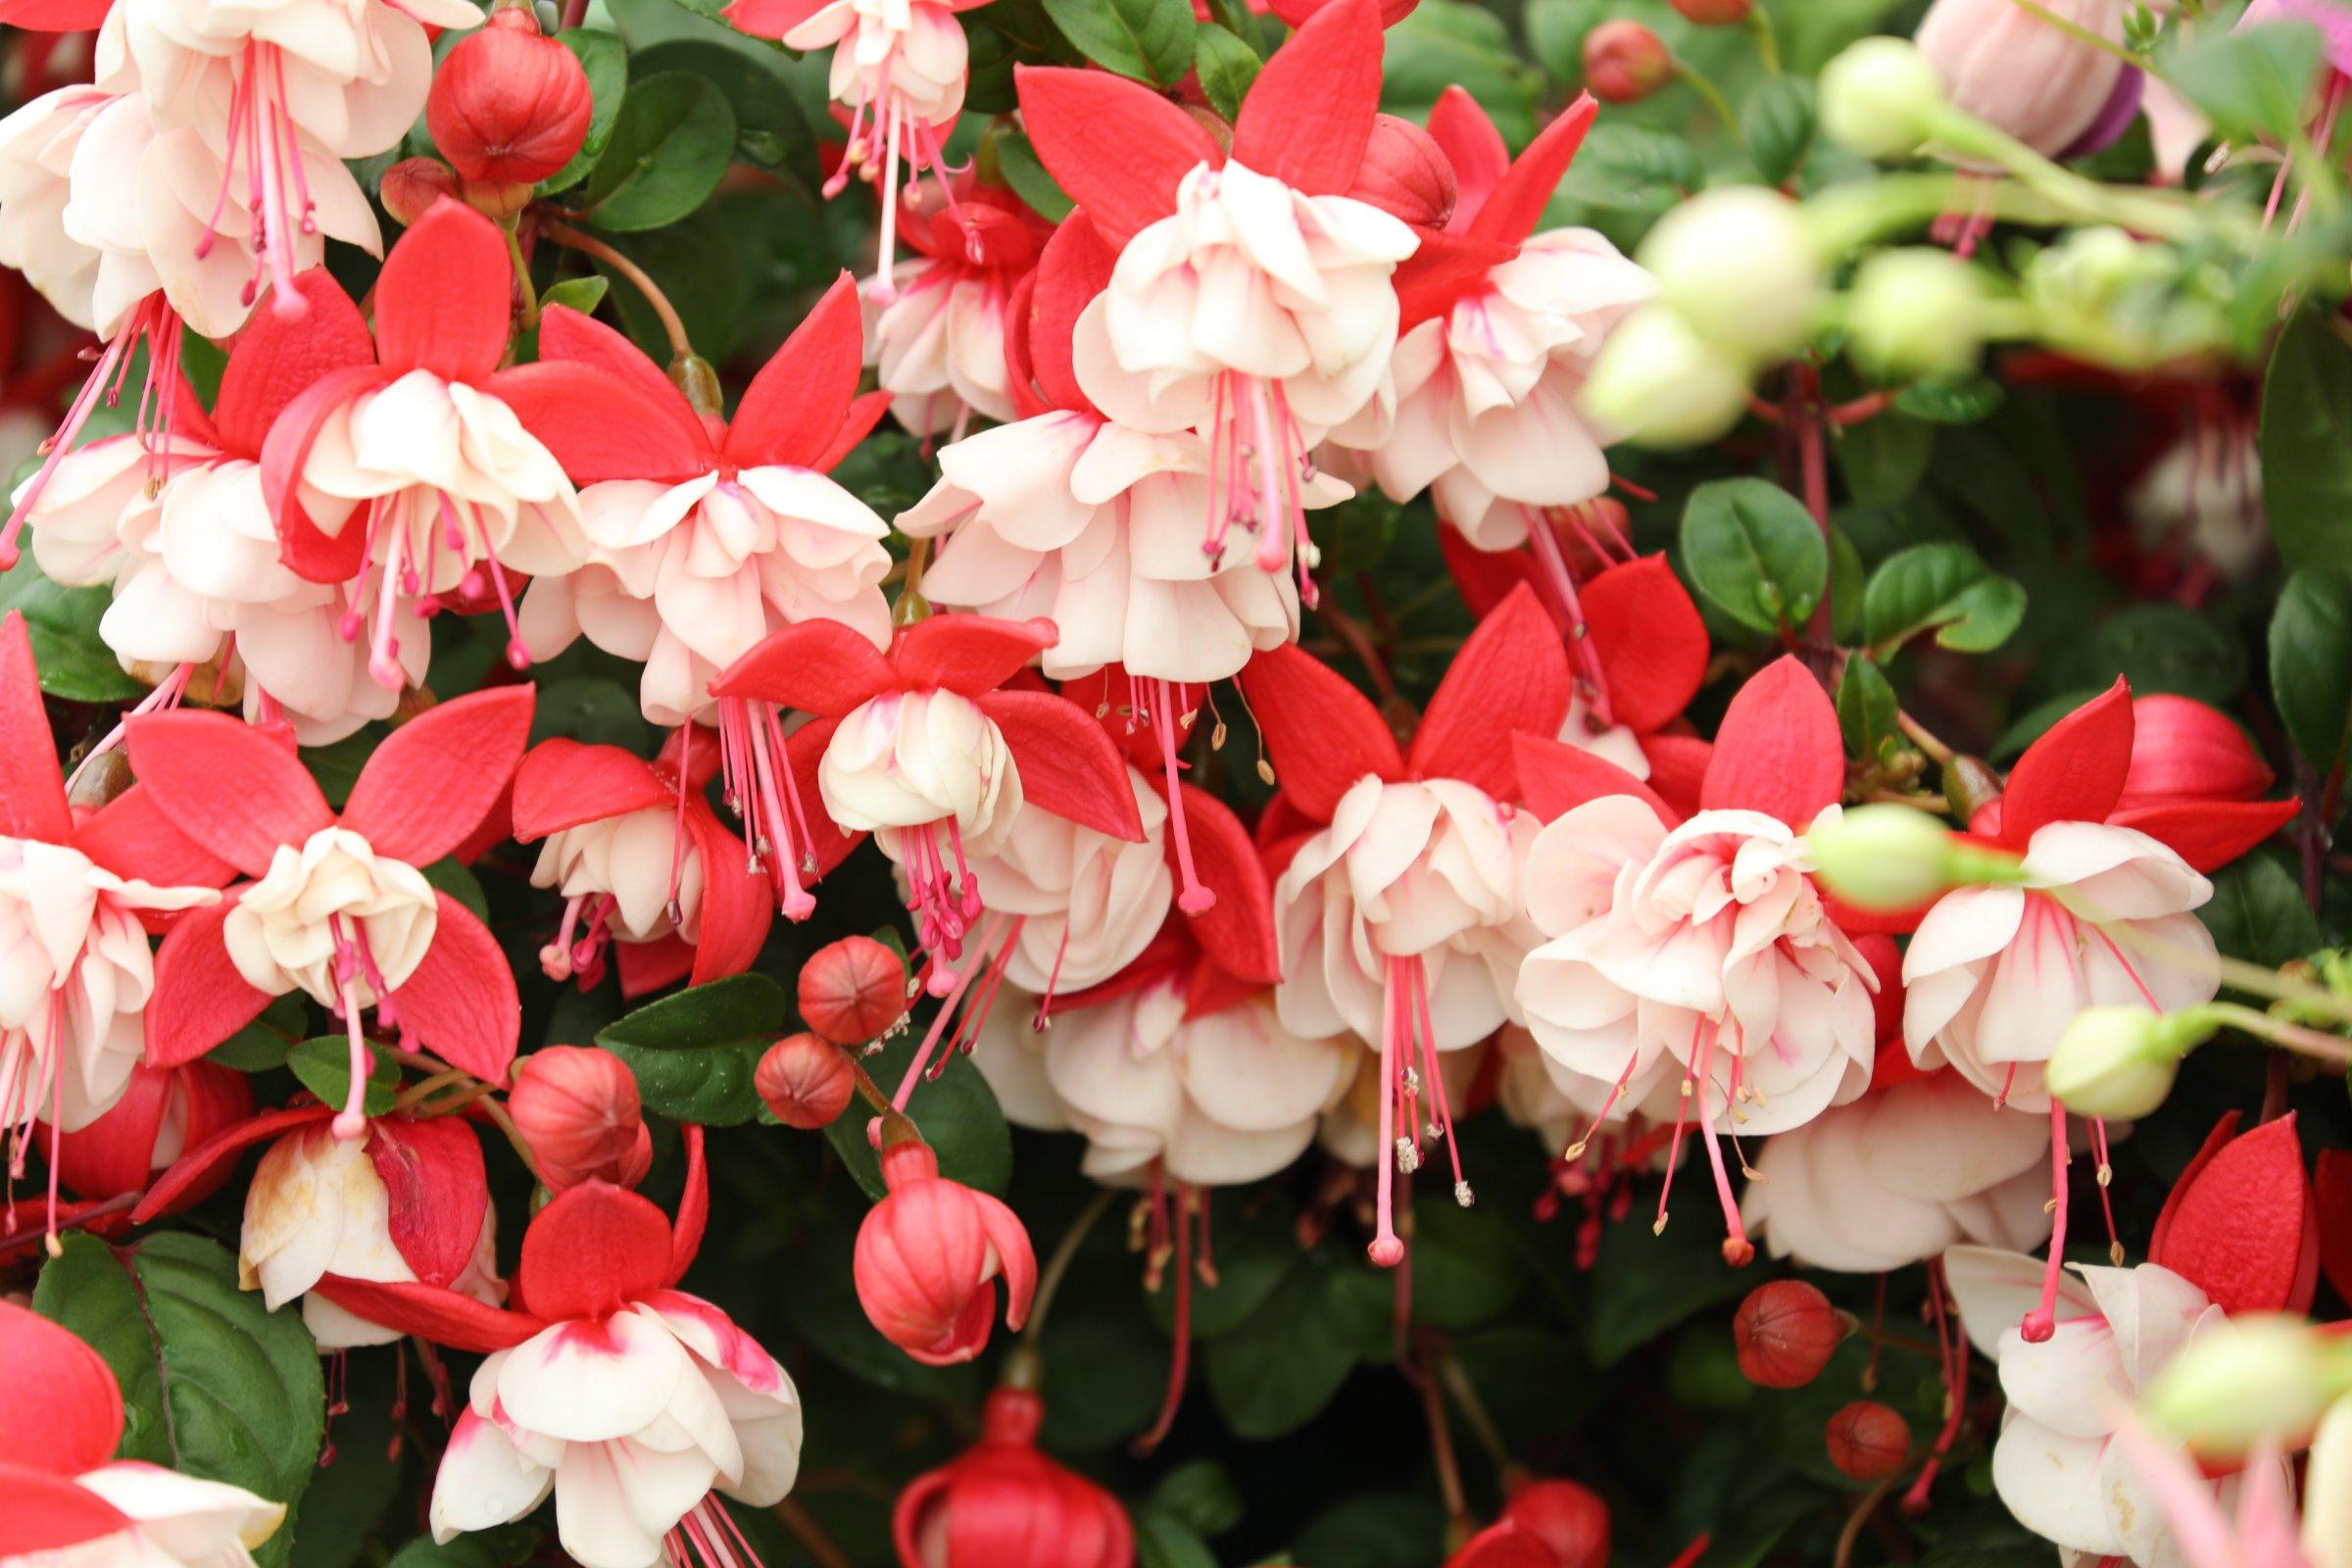 Red and white fuschia